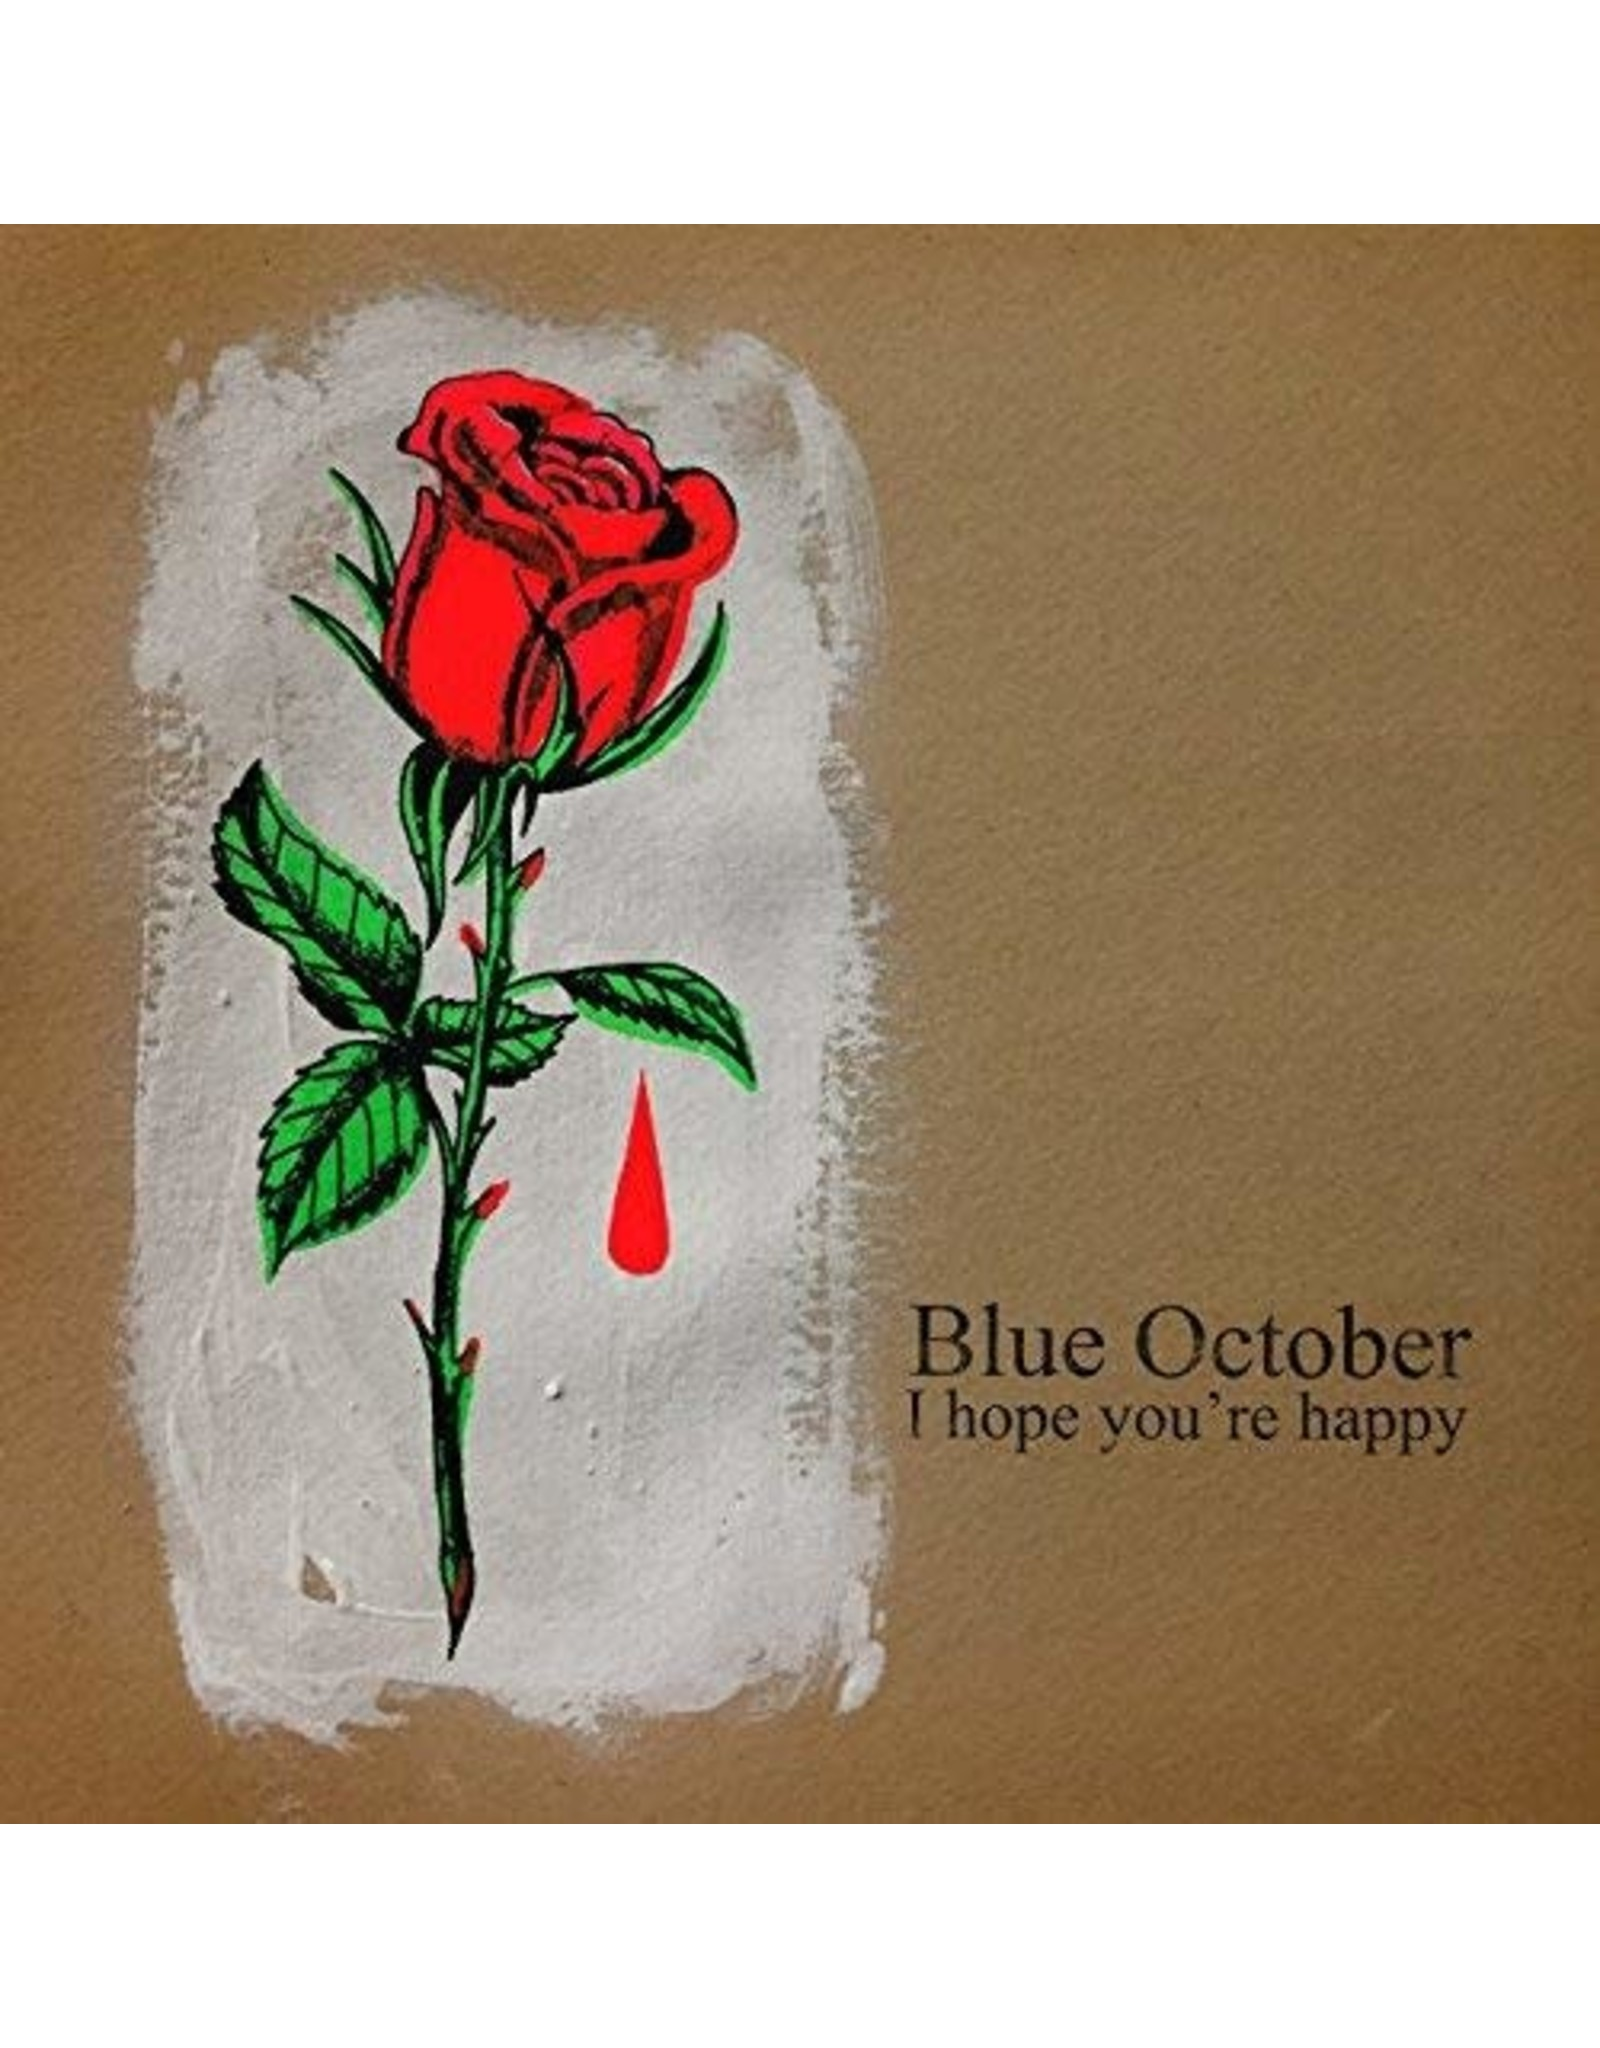 Blue October - I Hope You're Happy